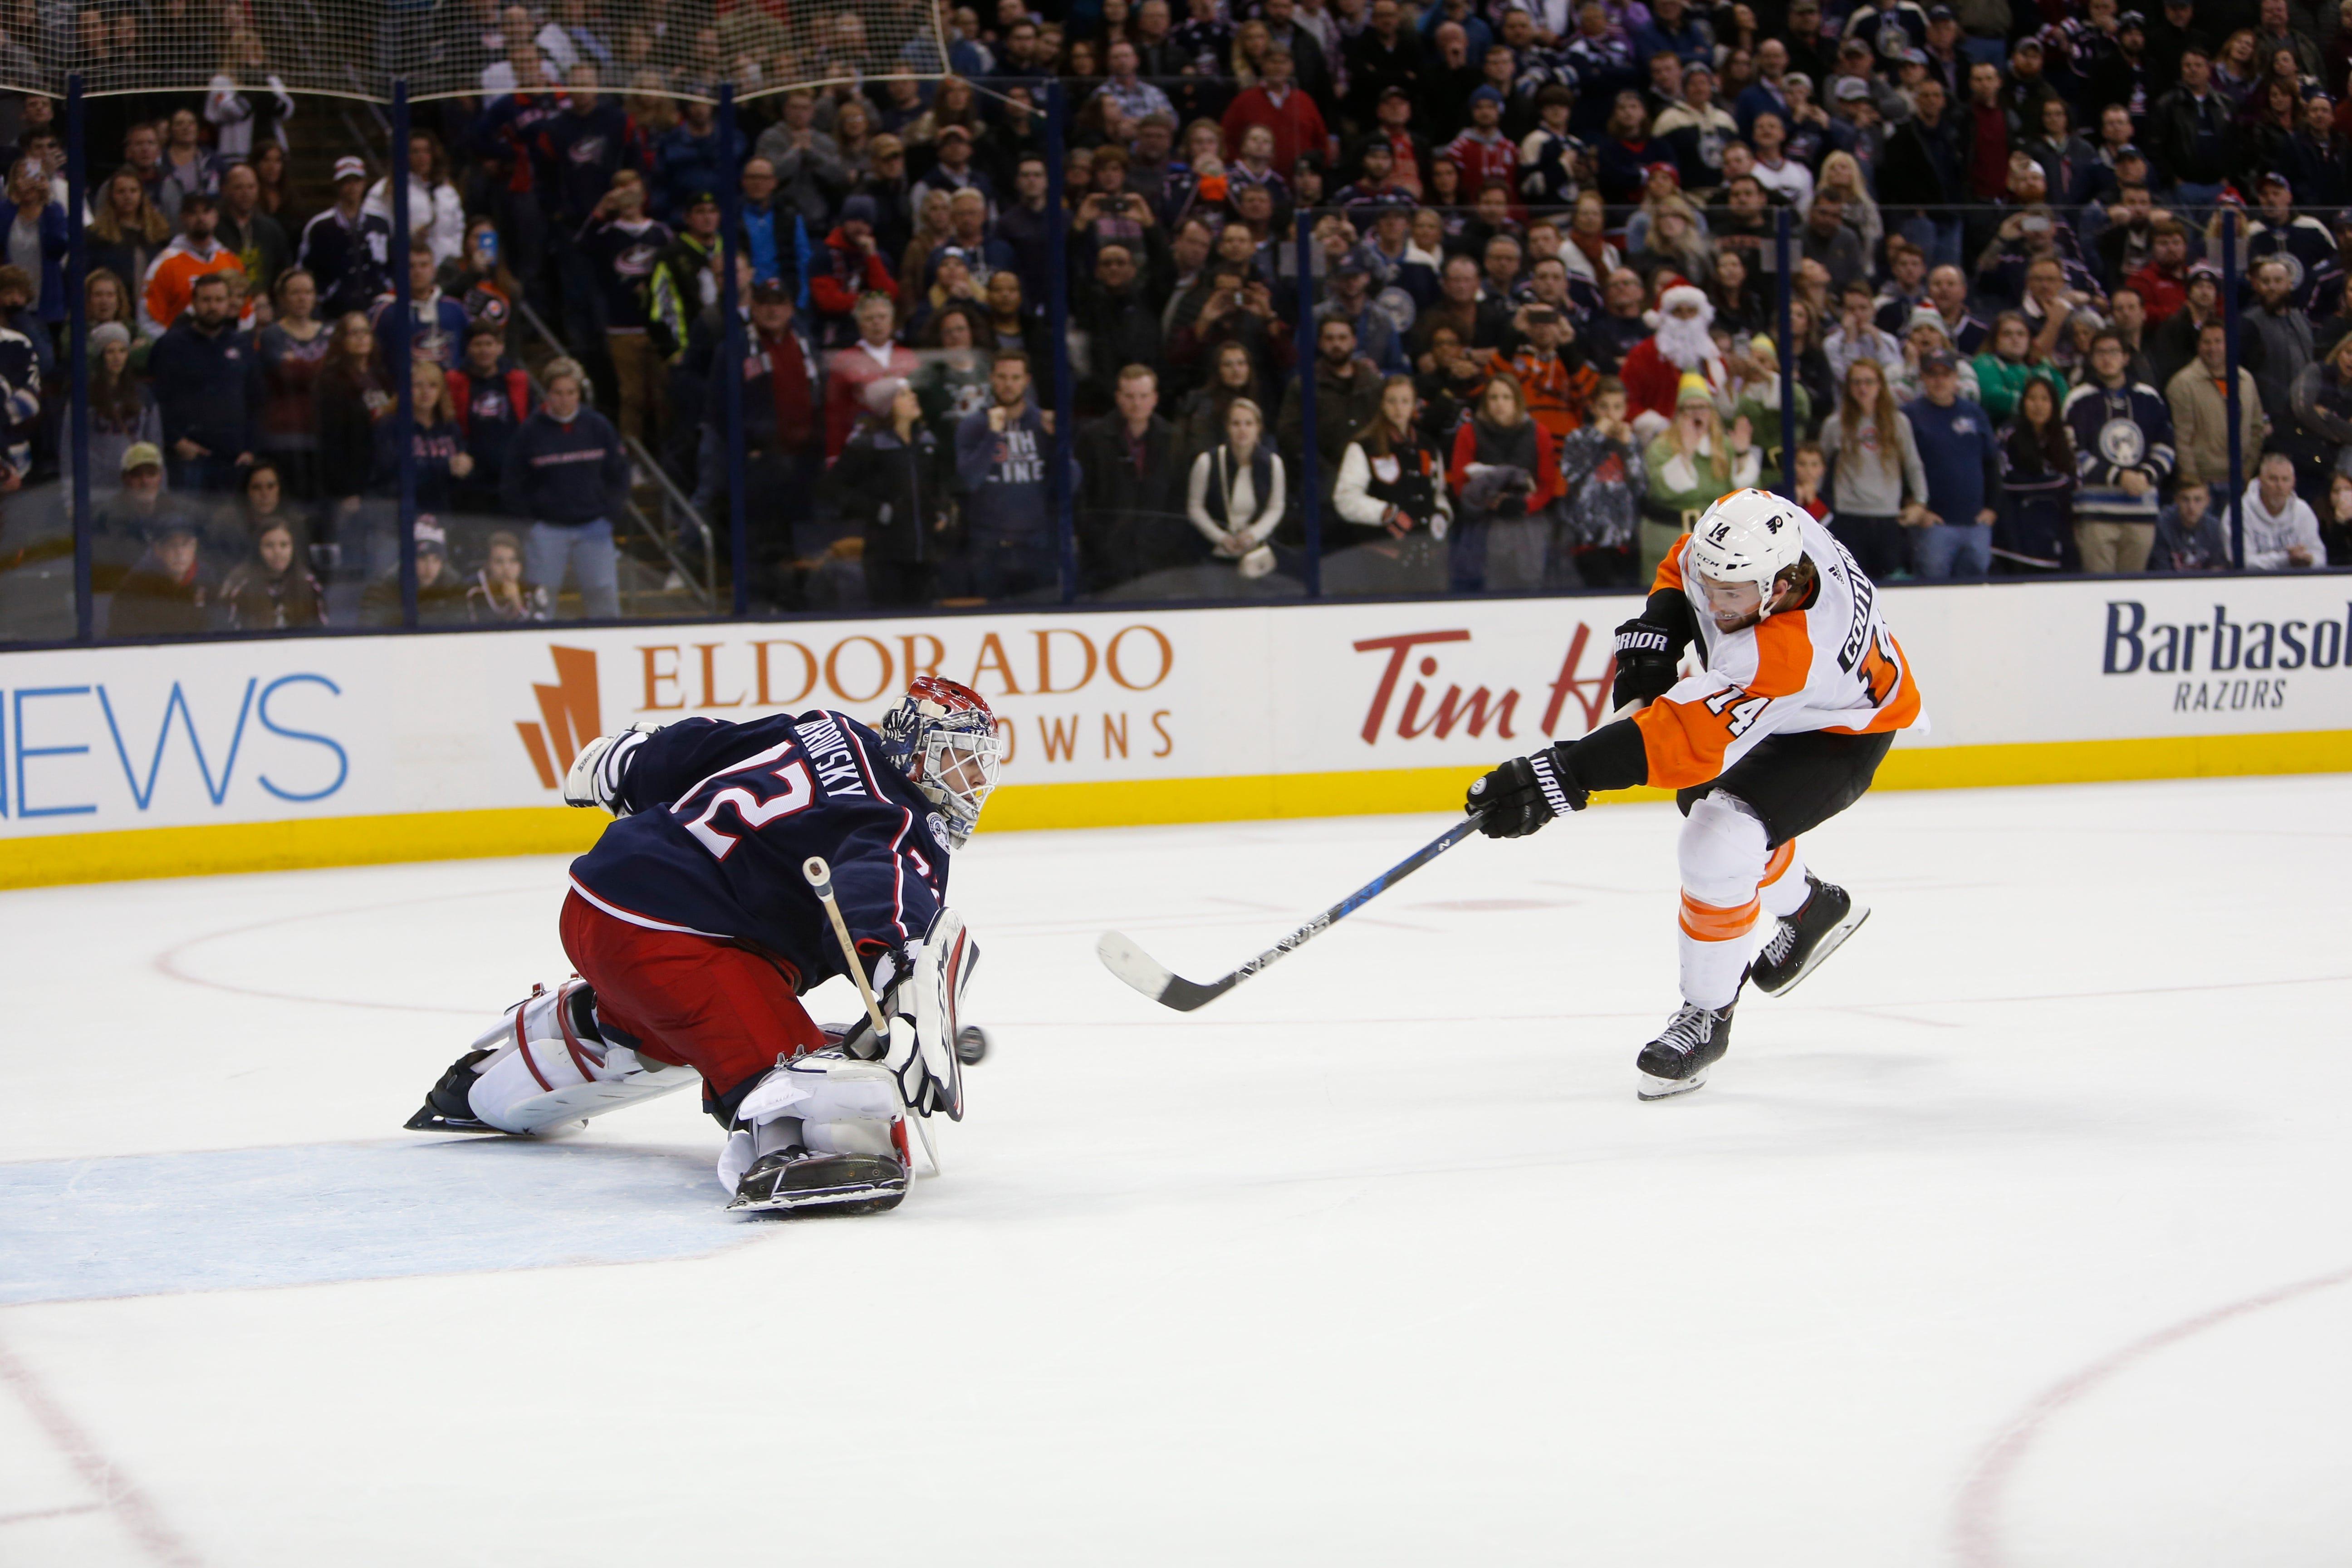 DuBois' 1st shootout goal lifts Blue Jackets over Flyers 2-1